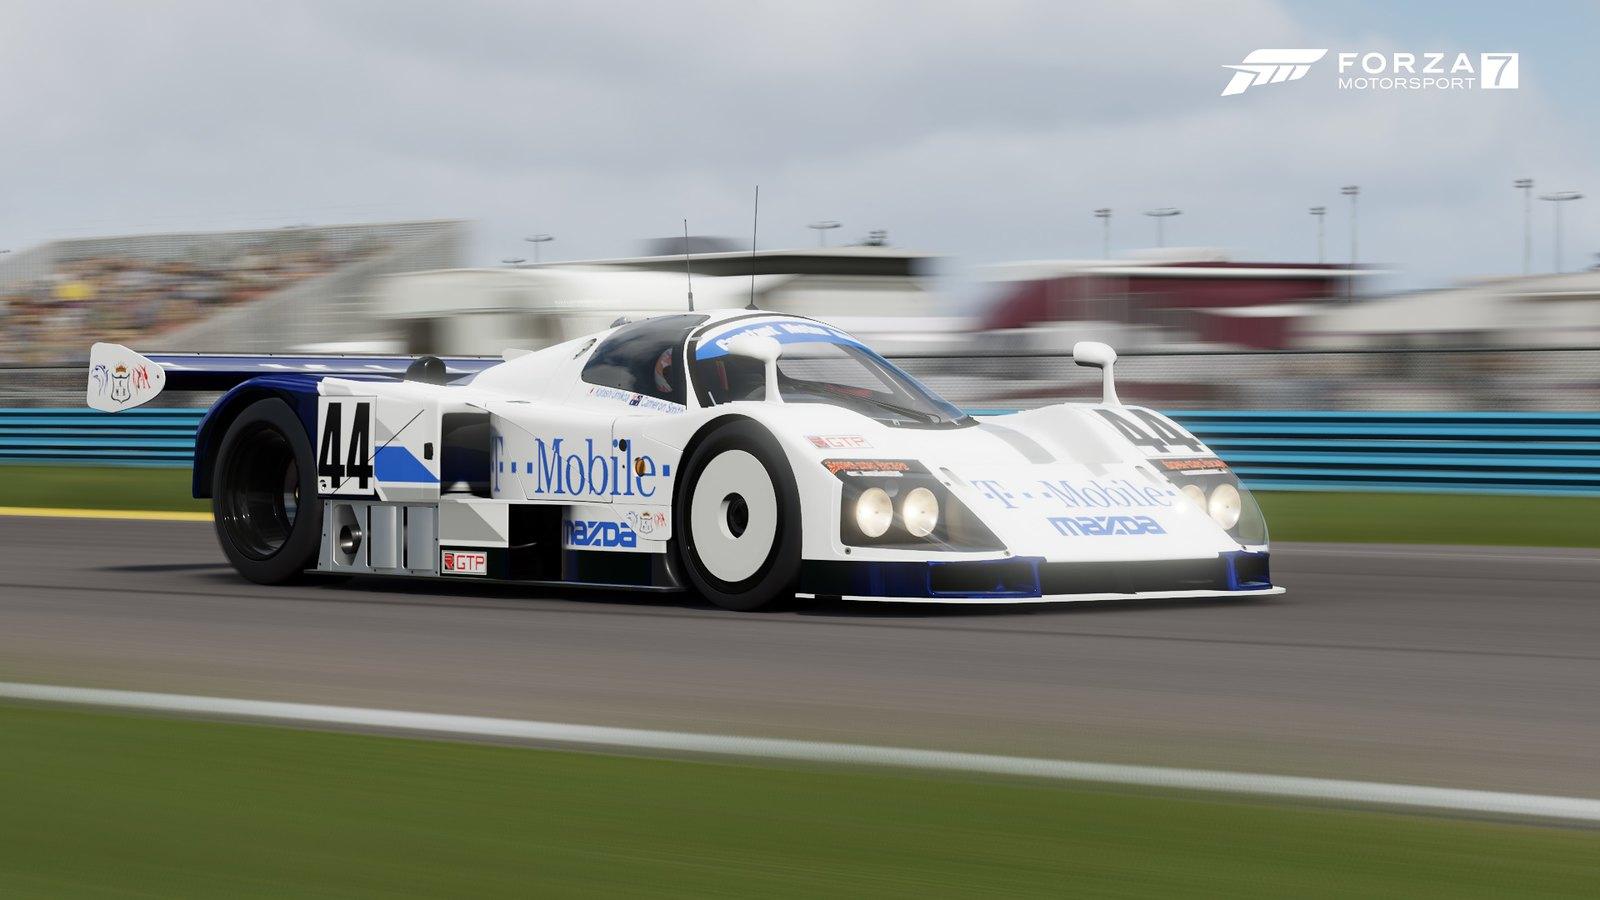 Classic 24 Hours of Daytona - Media 44720719890_8855538515_h